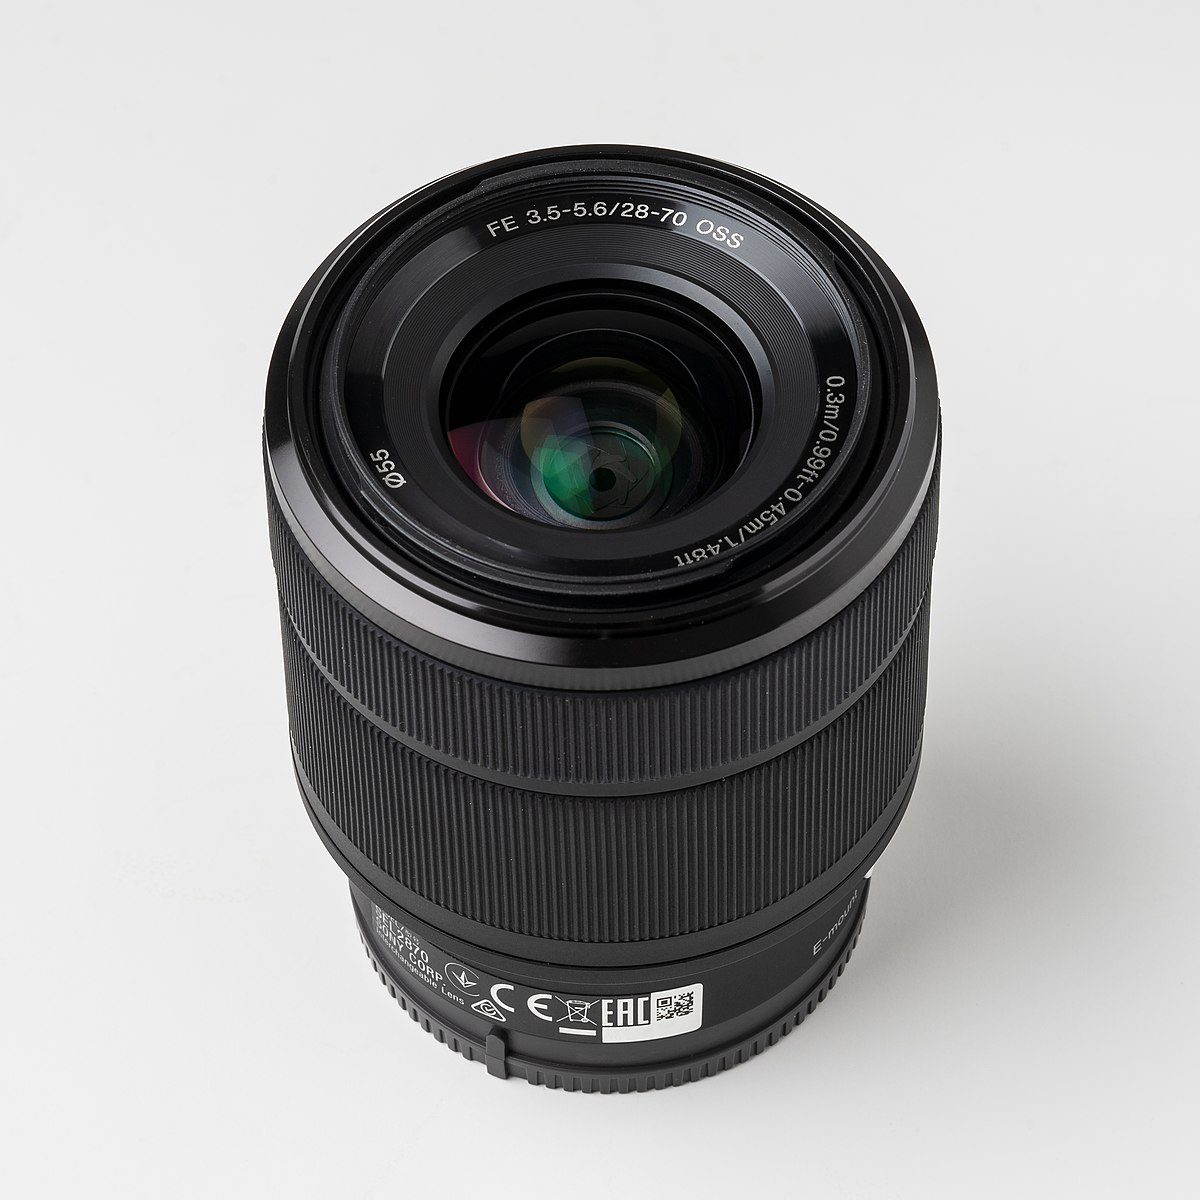 Sony FE 28-70mm Image